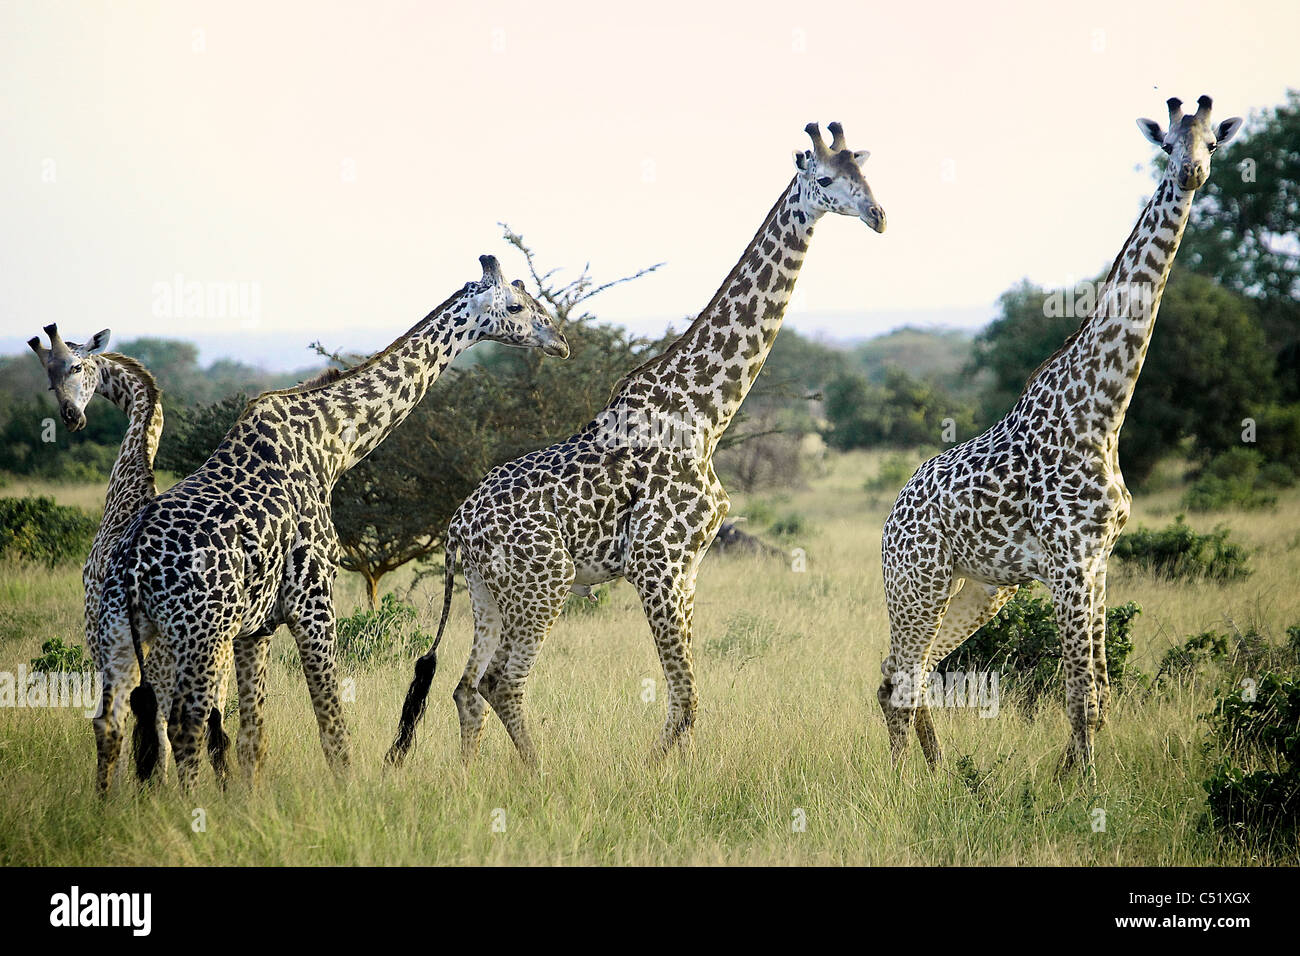 Giraffe Giraffa camelopardalis Saadani Tanzania Africa - Stock Image